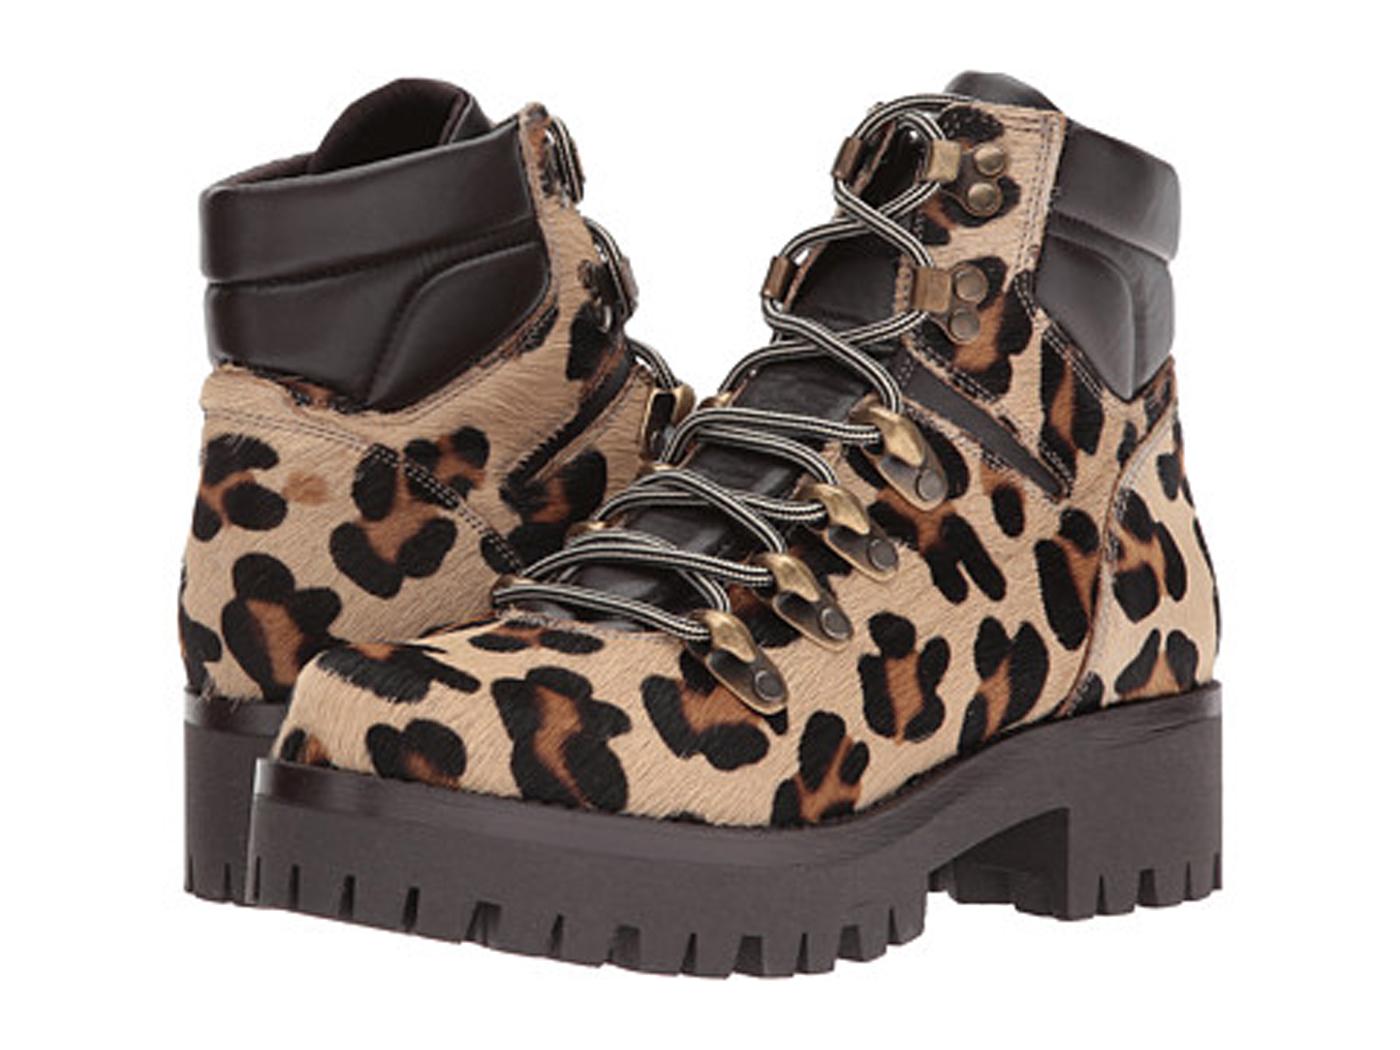 Shellys London Tulle Hiker Boot 6iELIrrVz